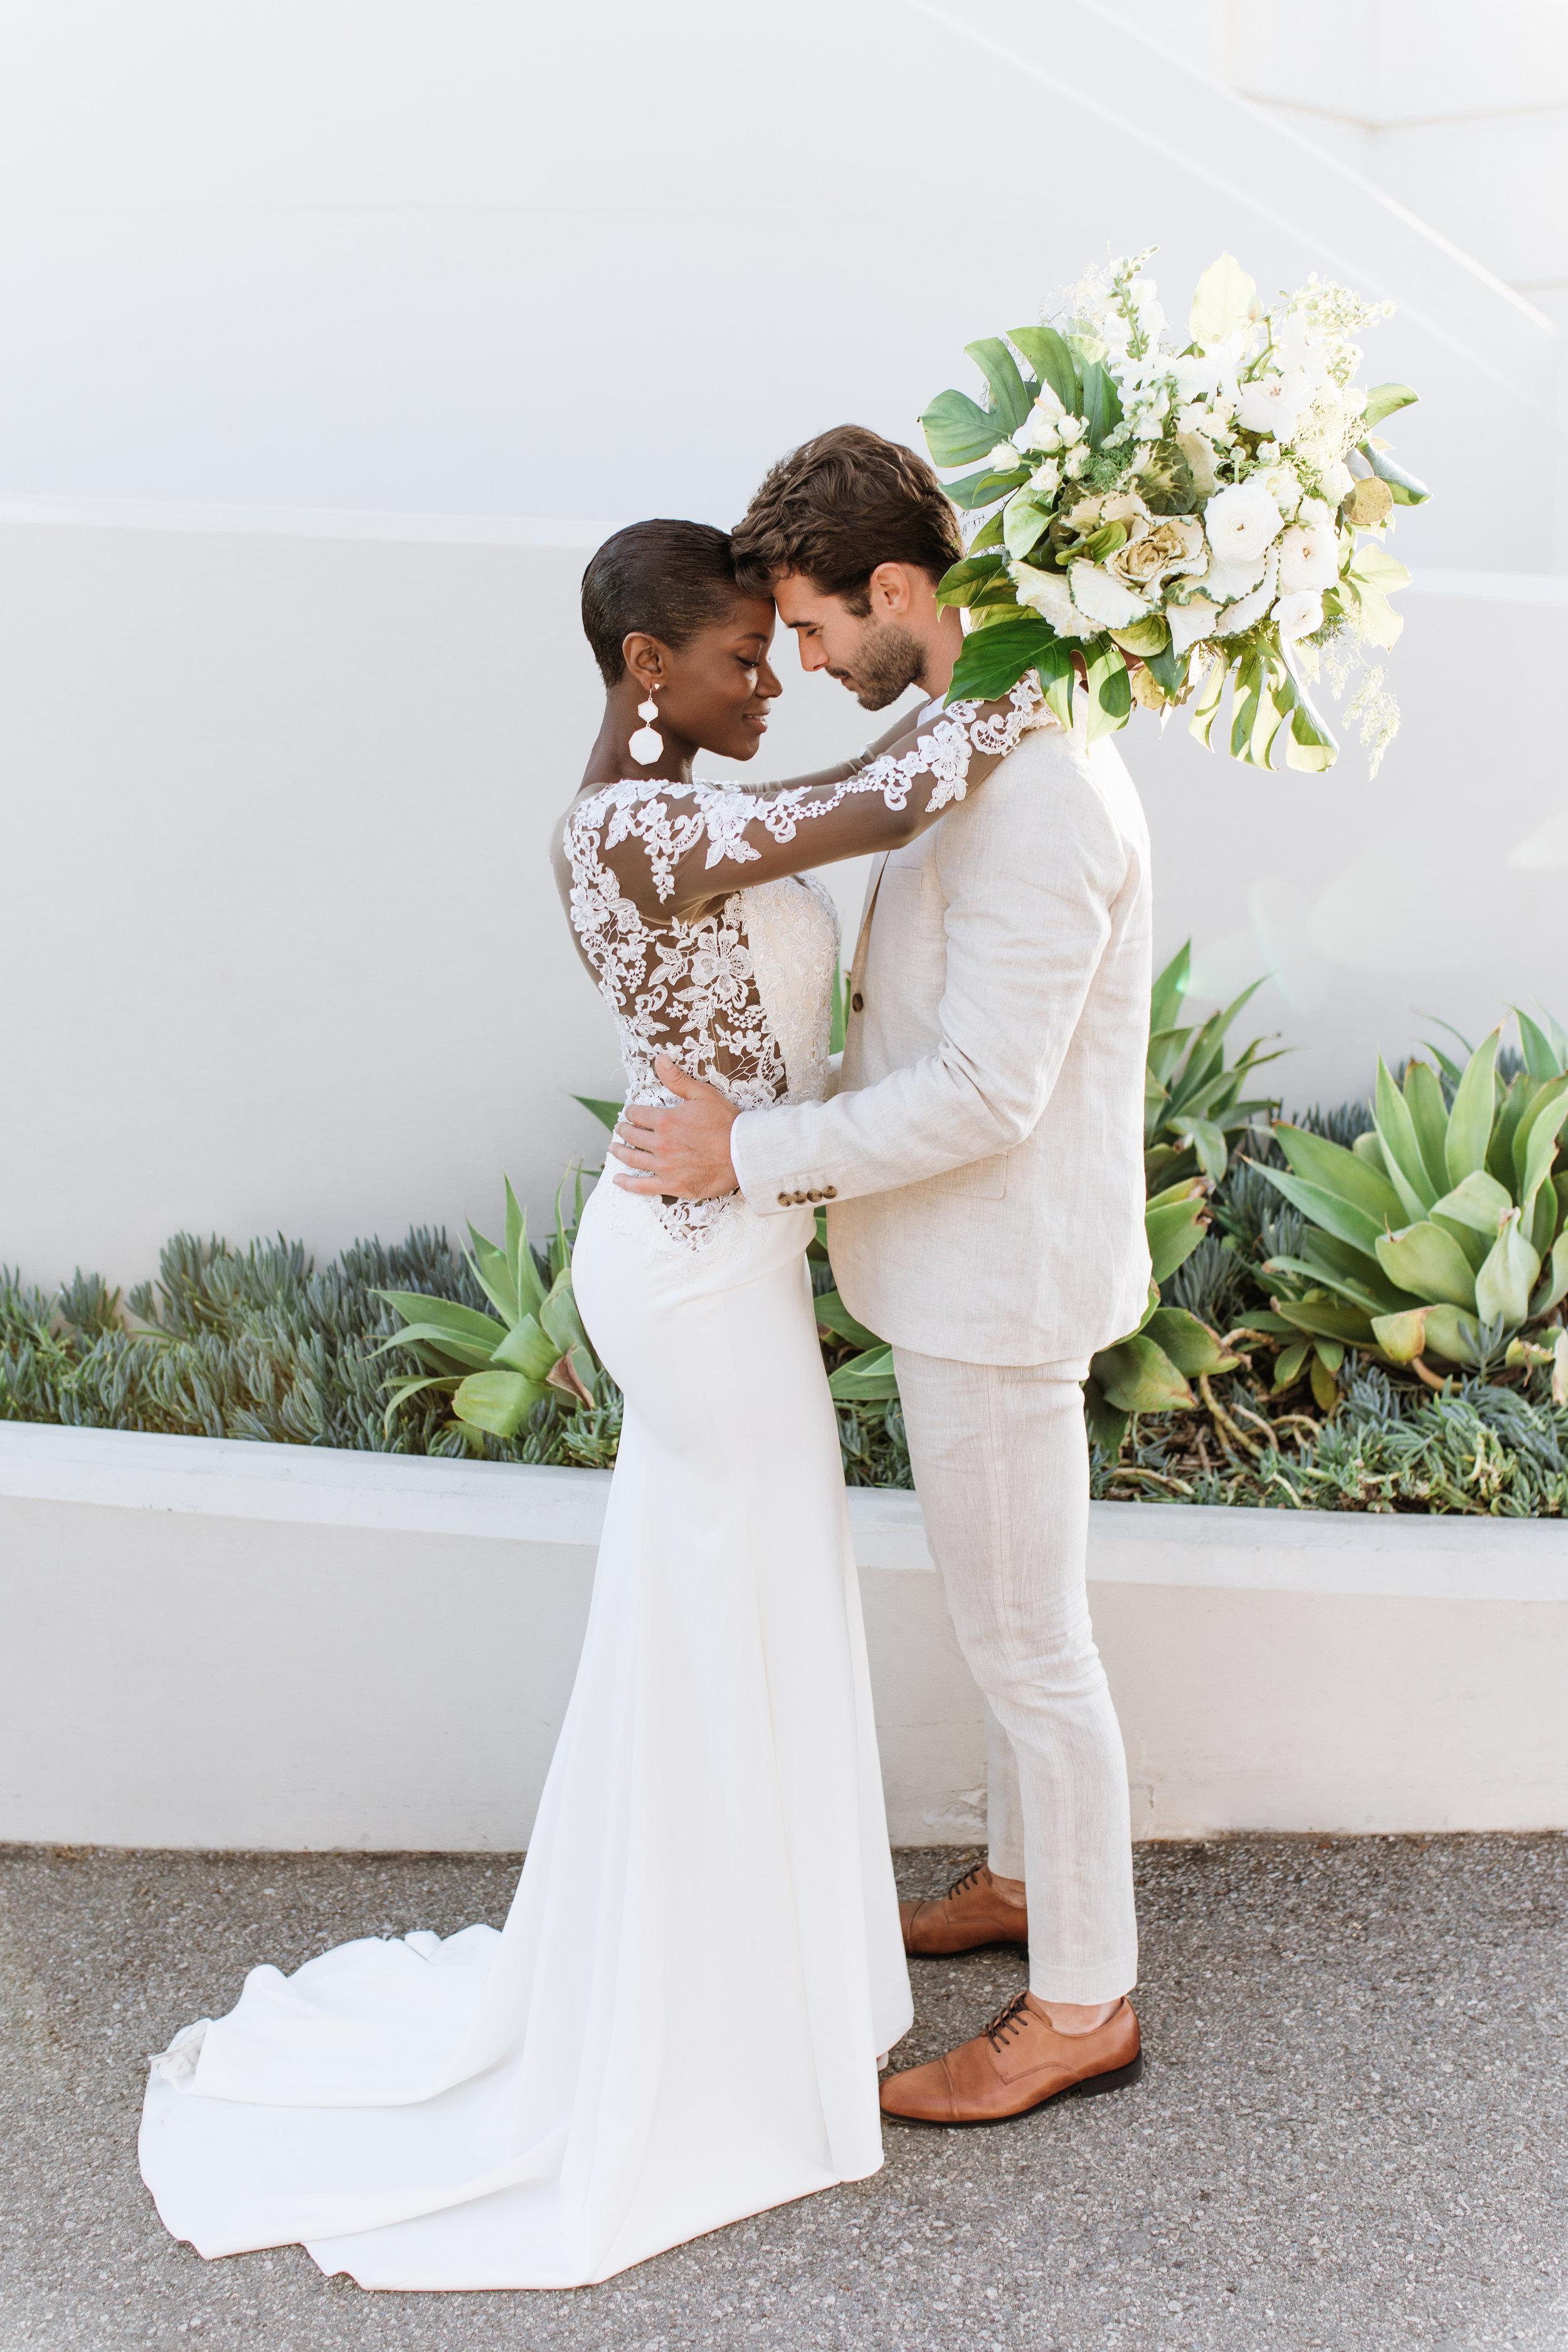 los-angeles-california-griffith-observatory-wedding-bridal-photography-michael-cozzens-72.jpg